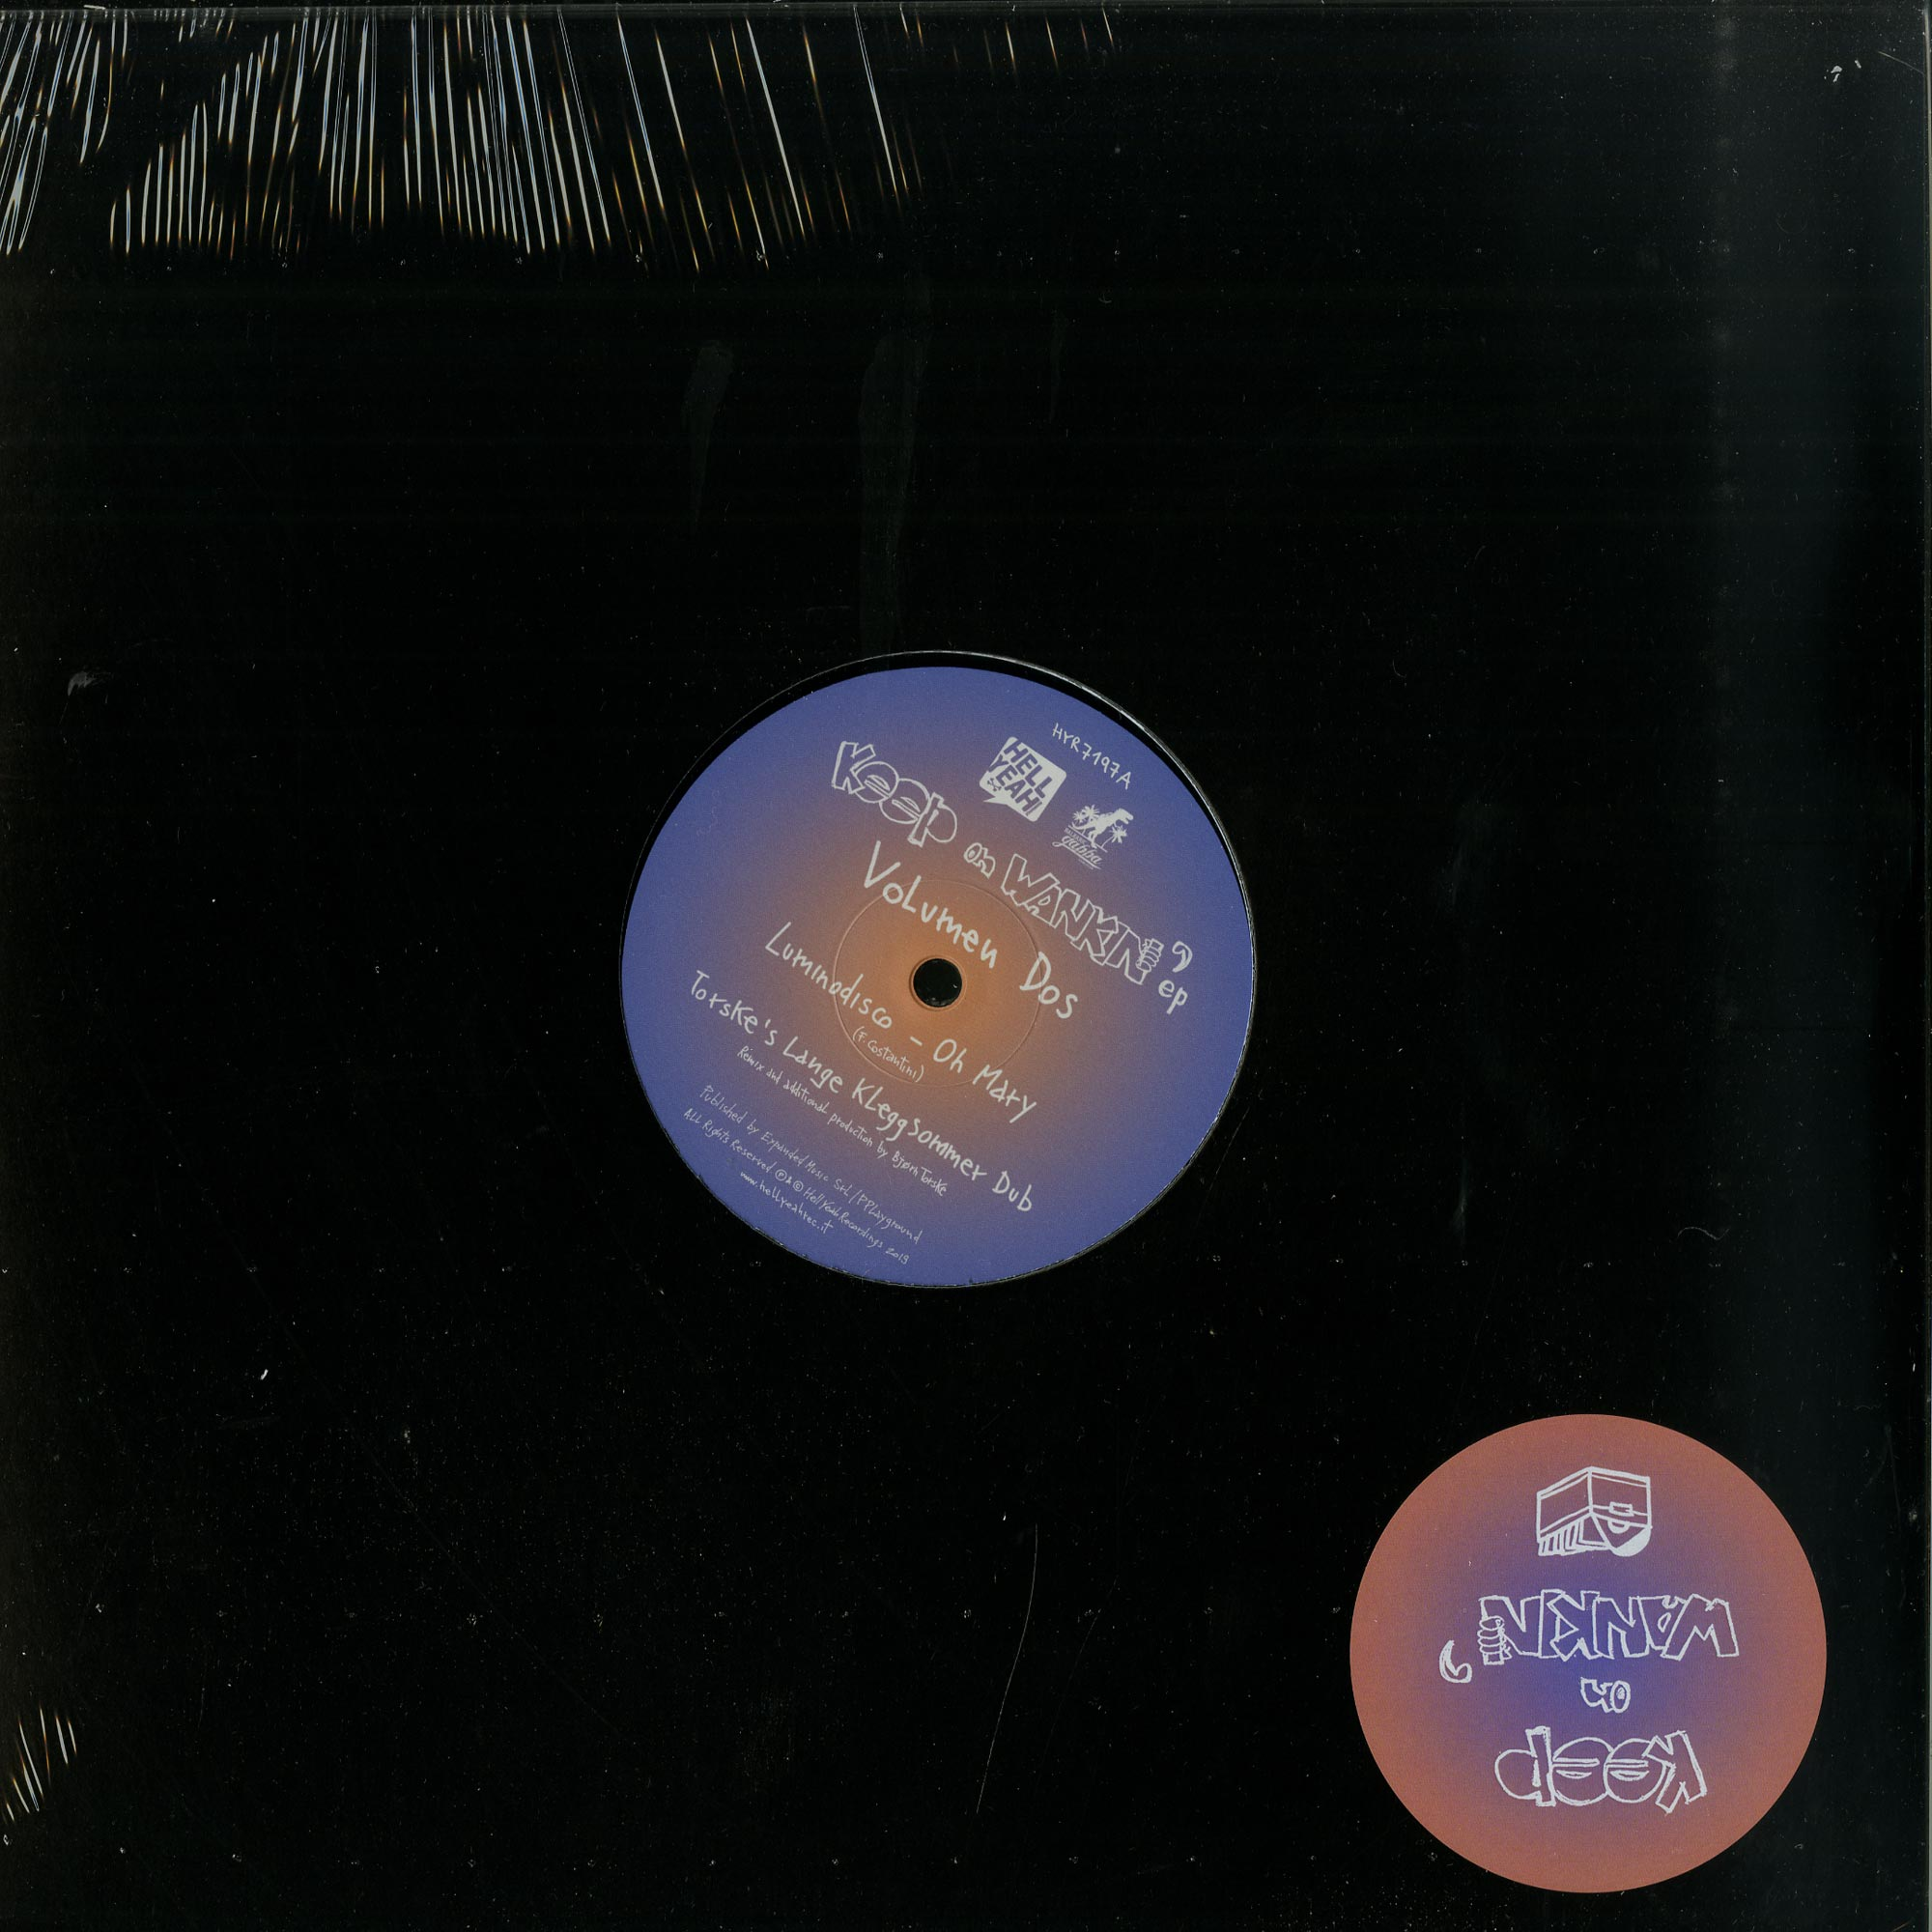 Luminodisco / Somerville & Wilson / Bjorn Torske / Fango - KEEP ON W... - VOLUMEN DOS